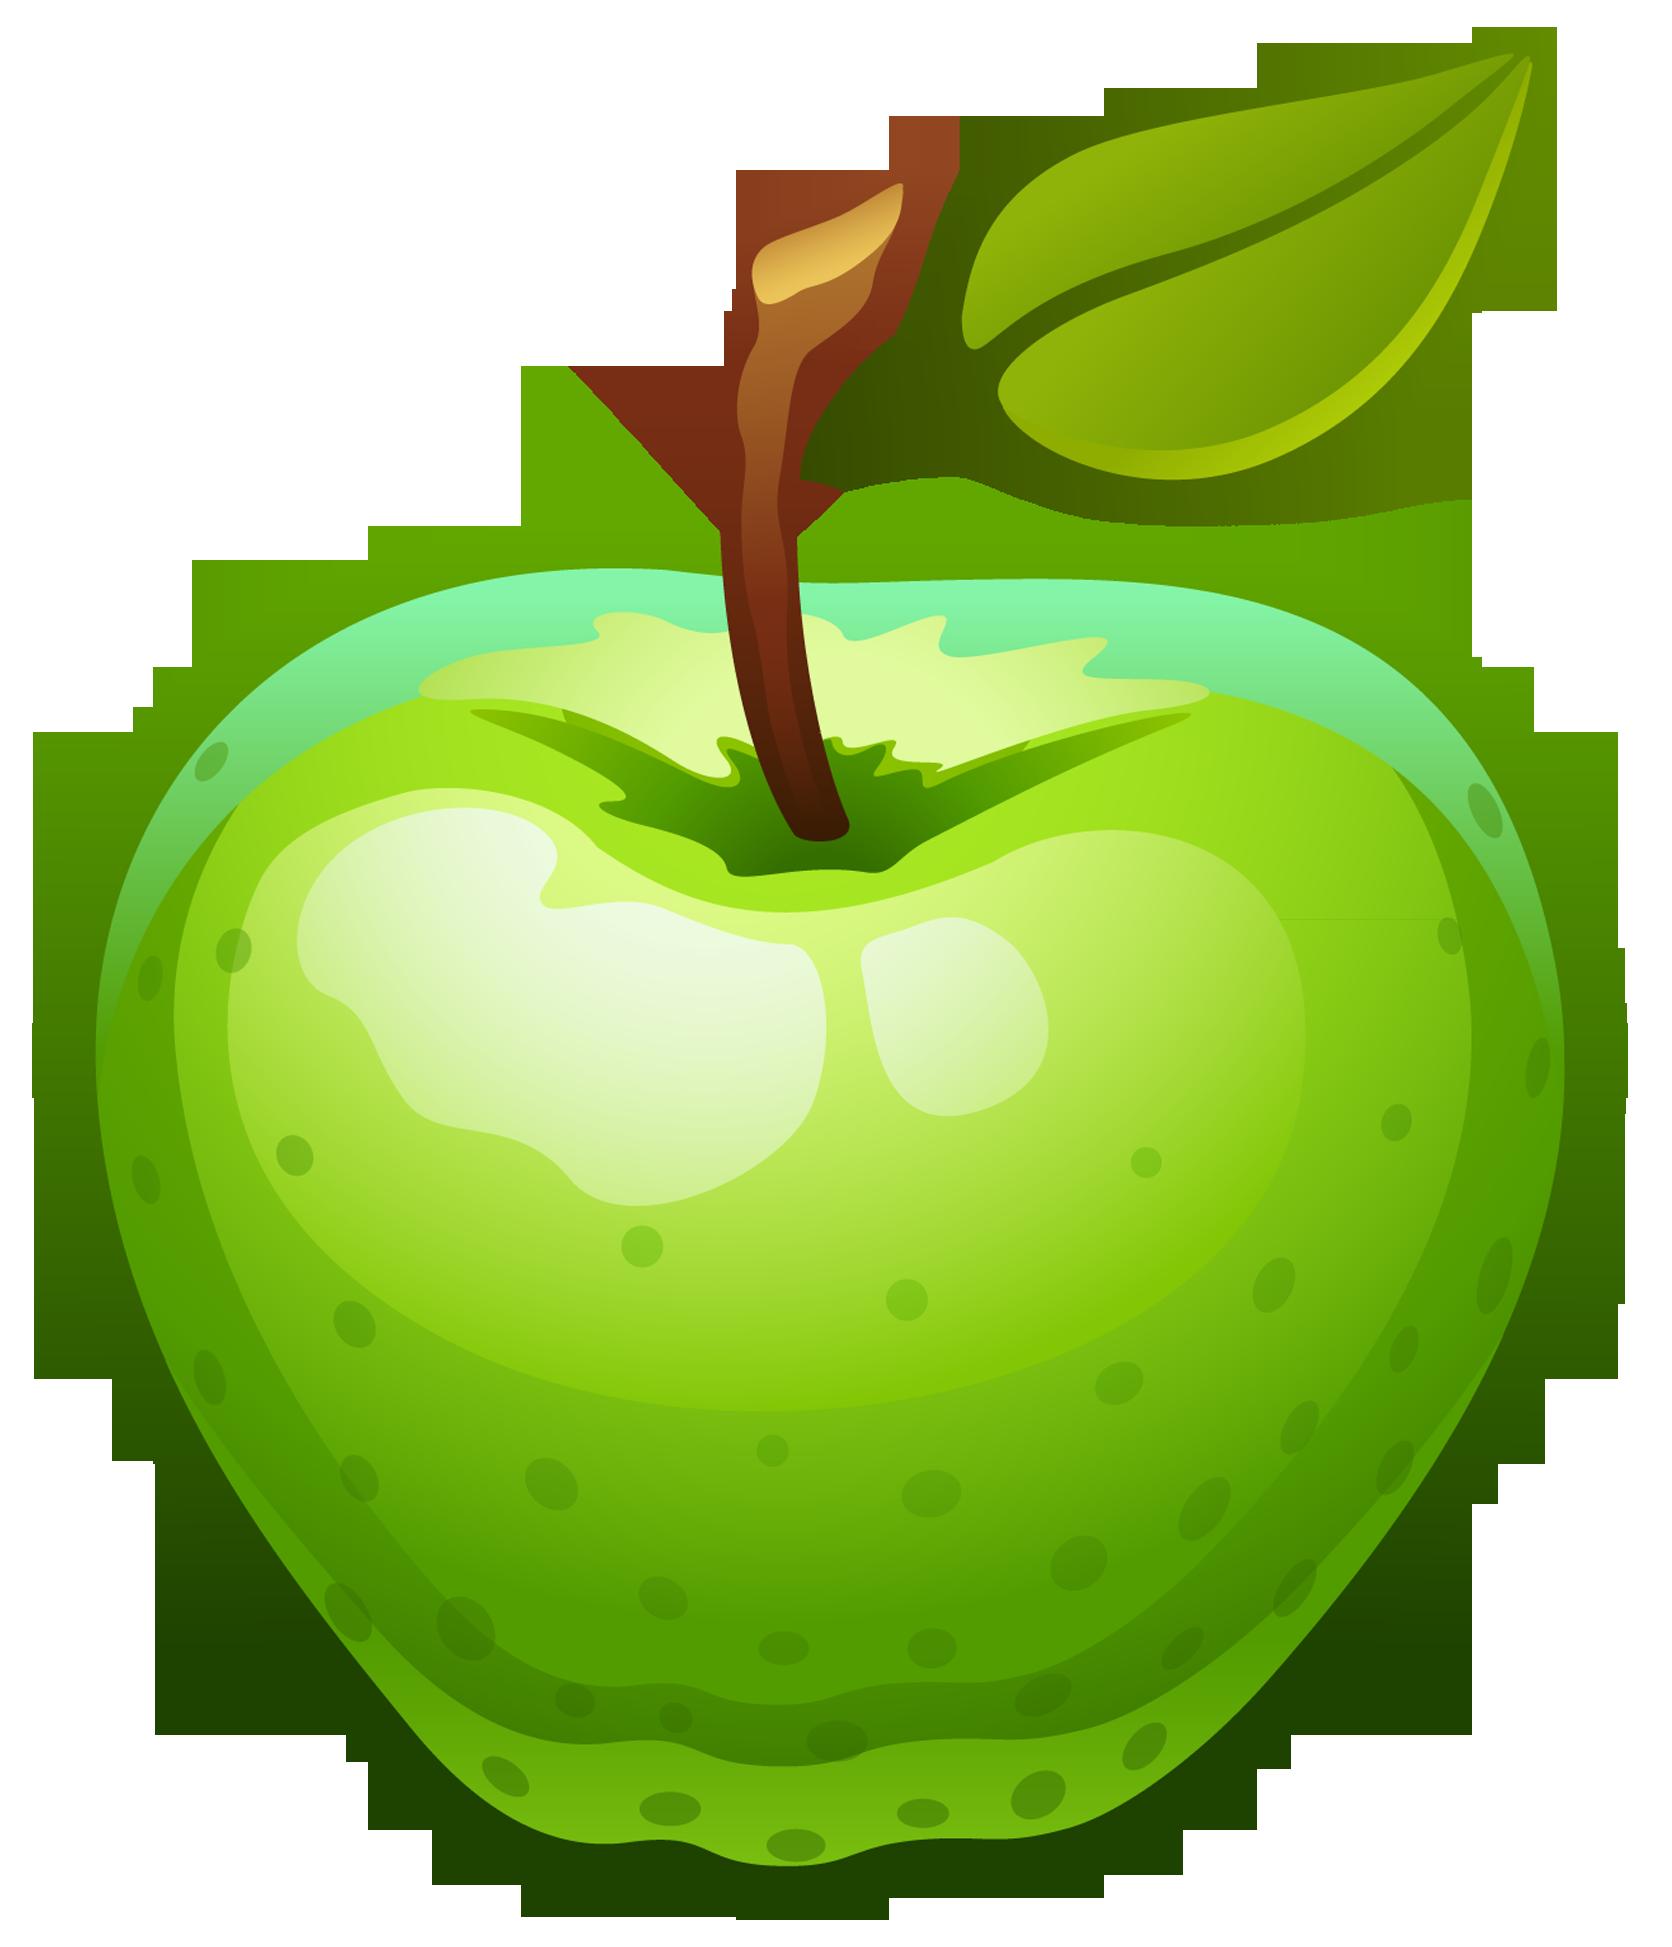 green apple clipart-green apple clipart-11